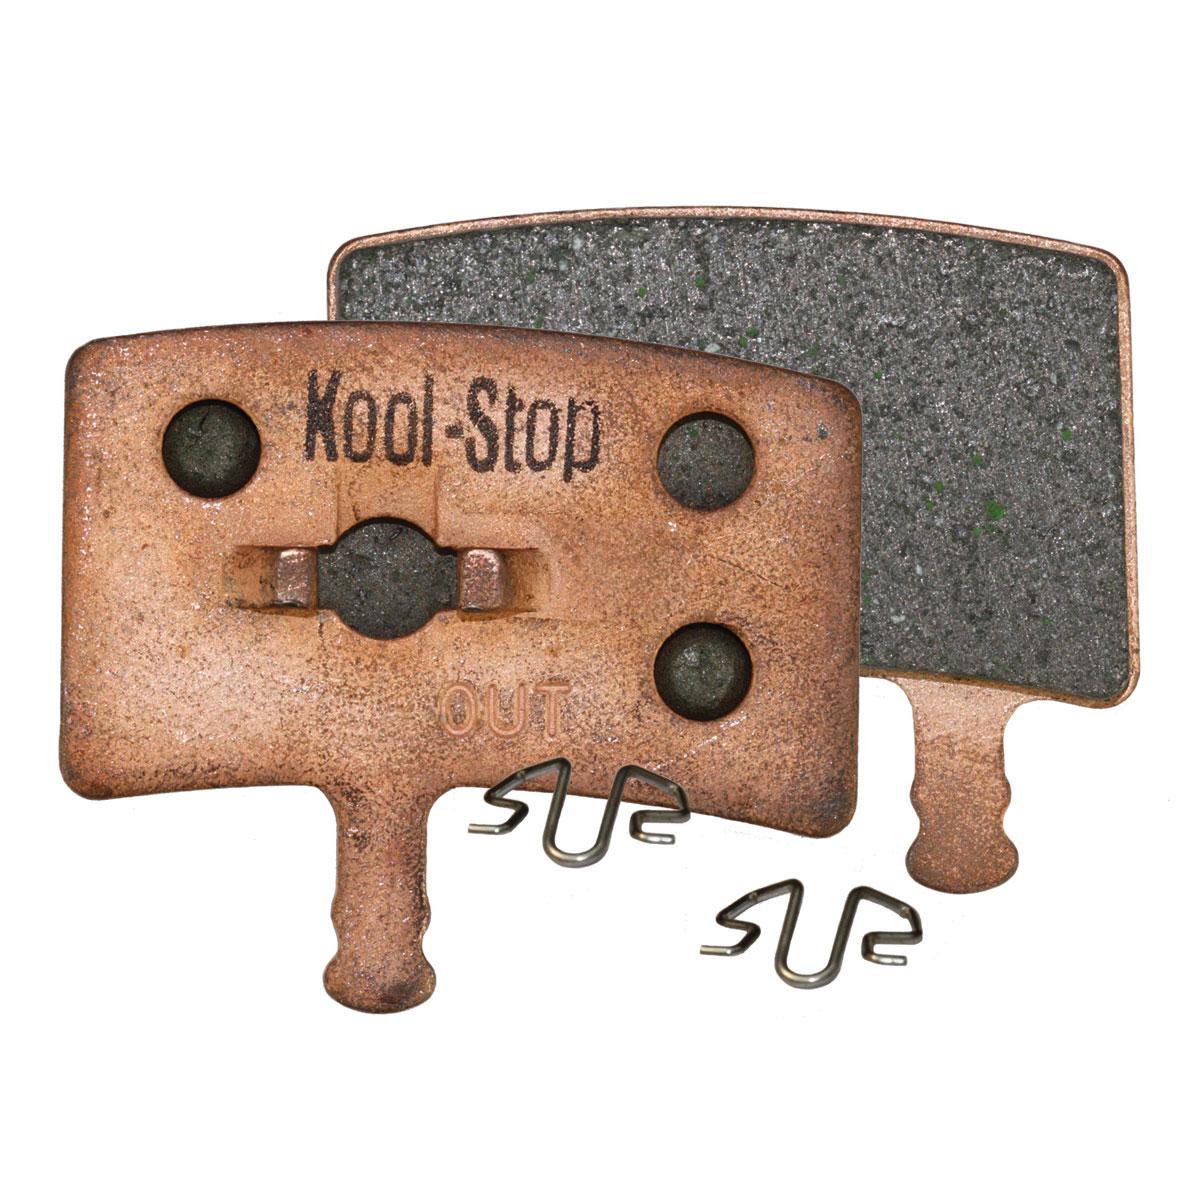 Destičky brzdové Kool Stop HAYES Stroker Trail, Carbon, Gram  - sintered